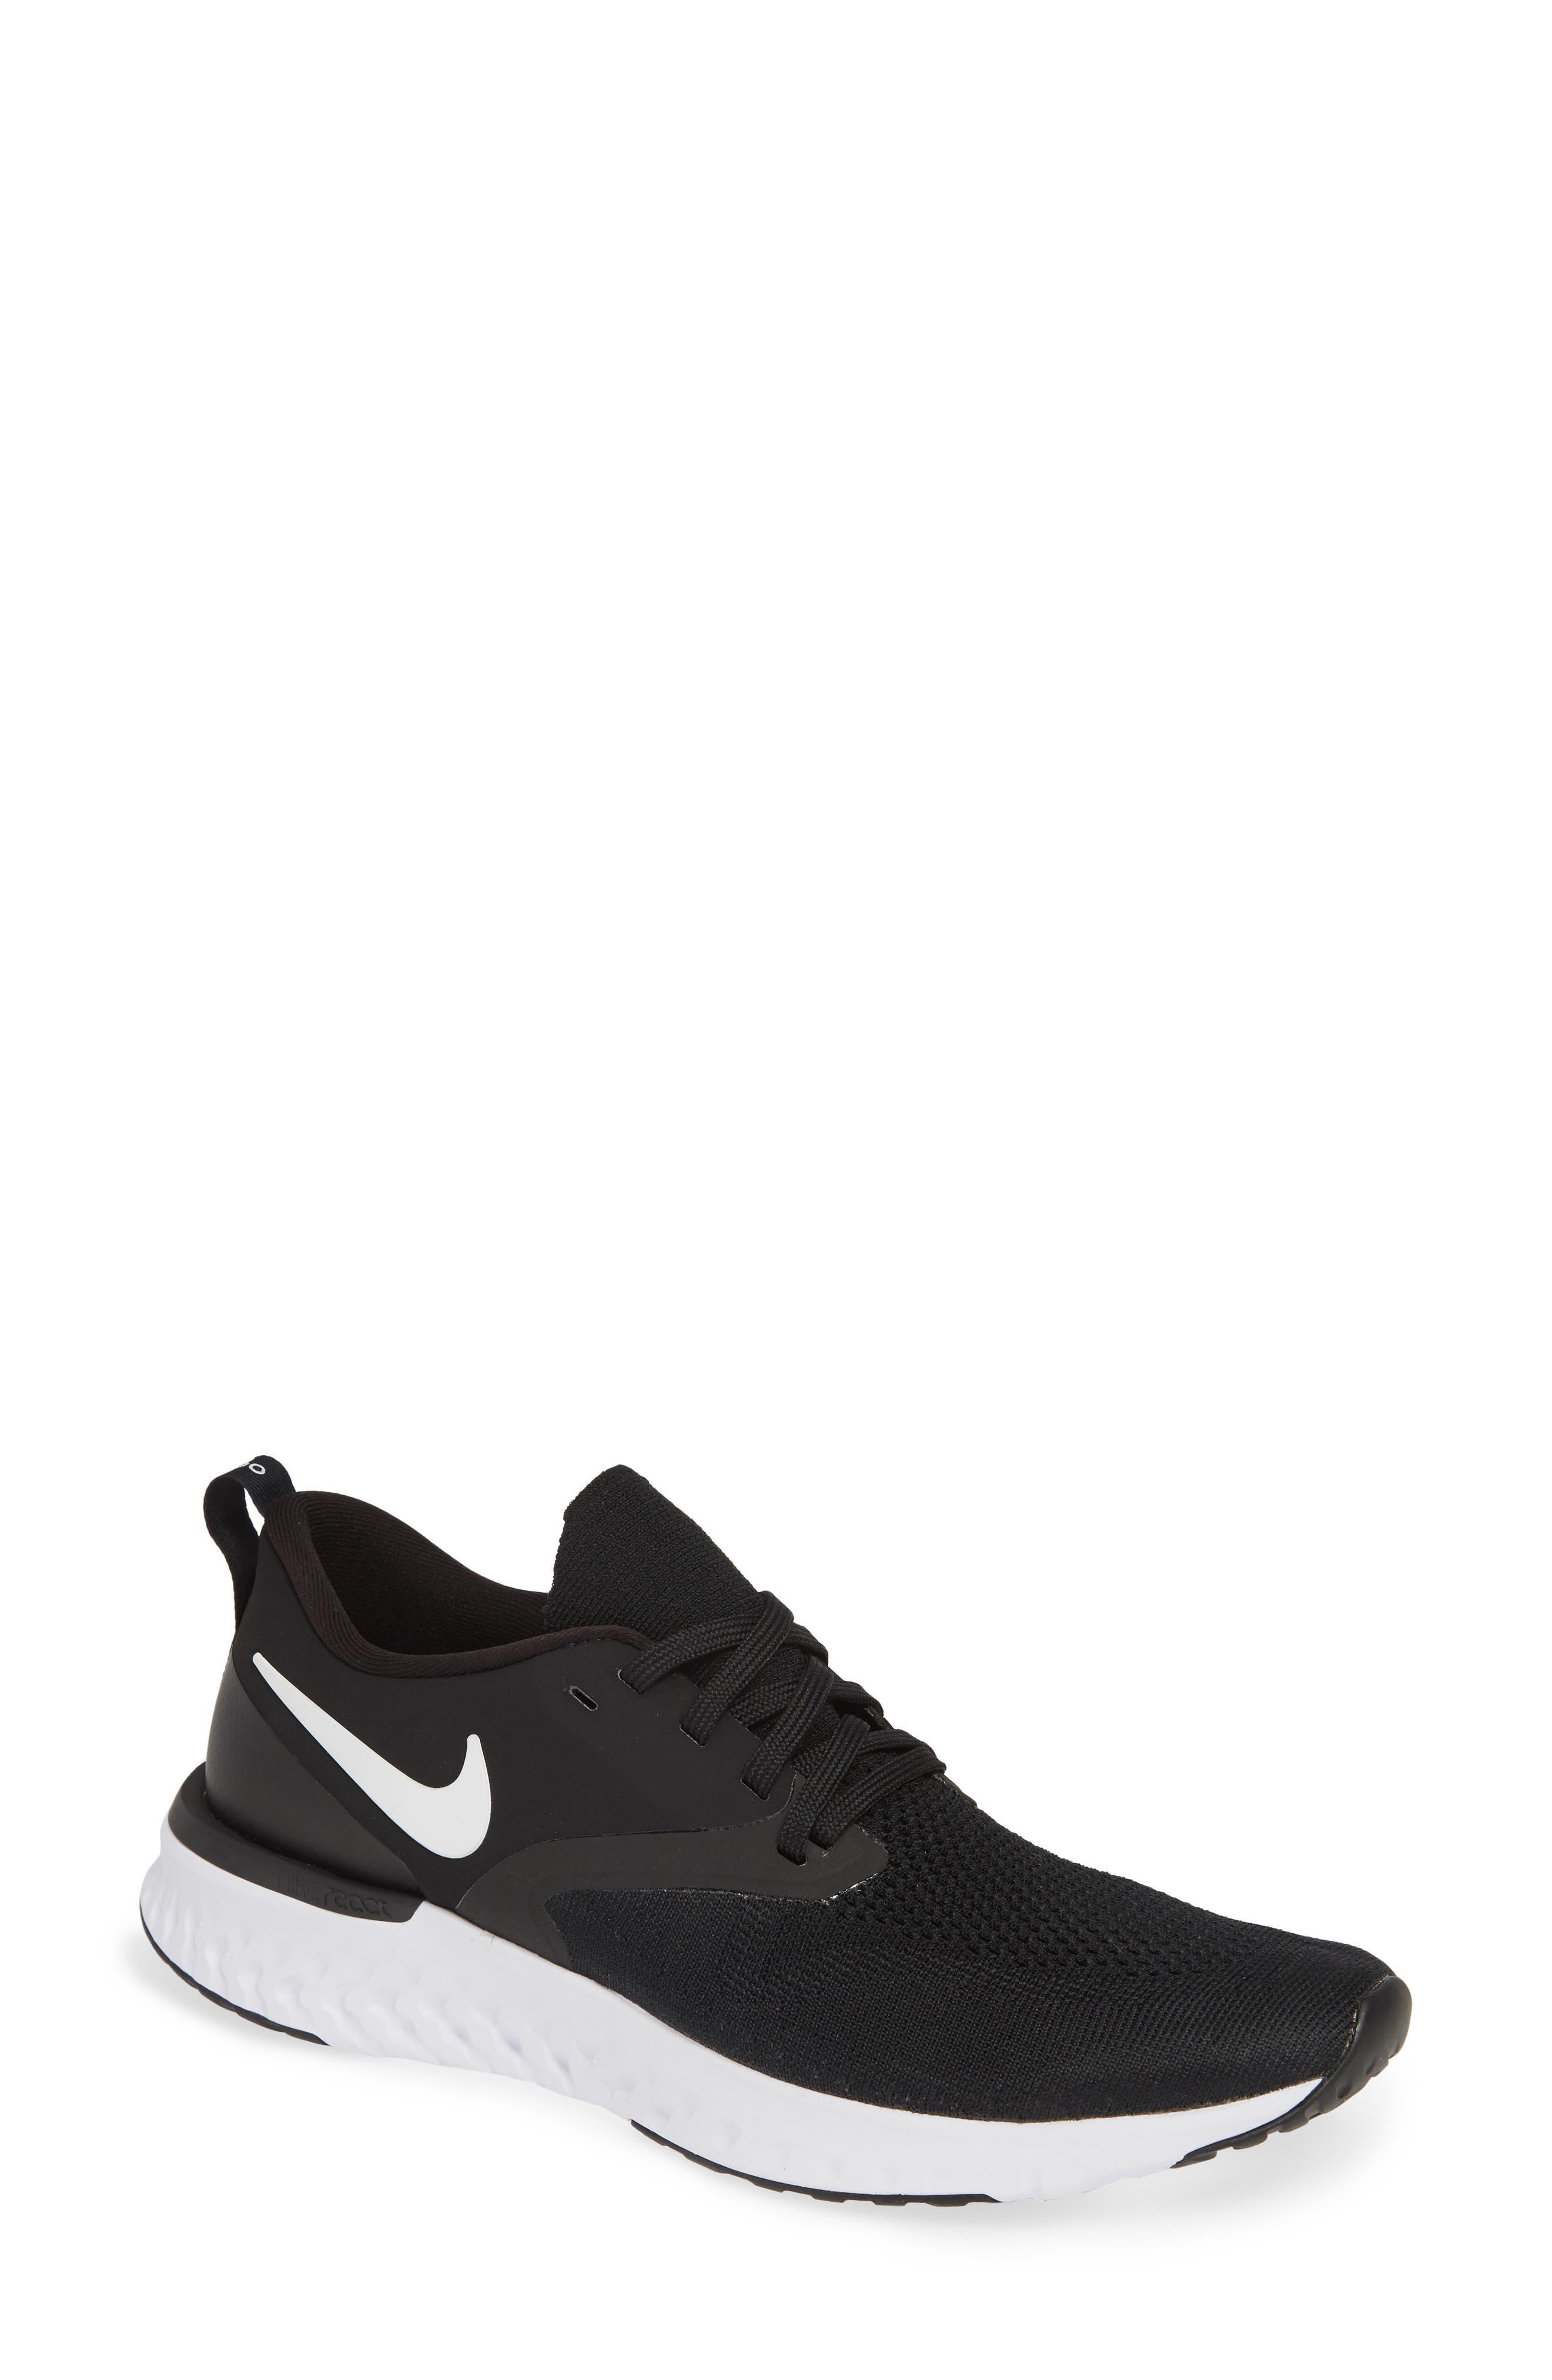 NIKE, Odyssey React 2 Flyknit Running Shoe, Main thumbnail 1, color, BLACK/ WHITE